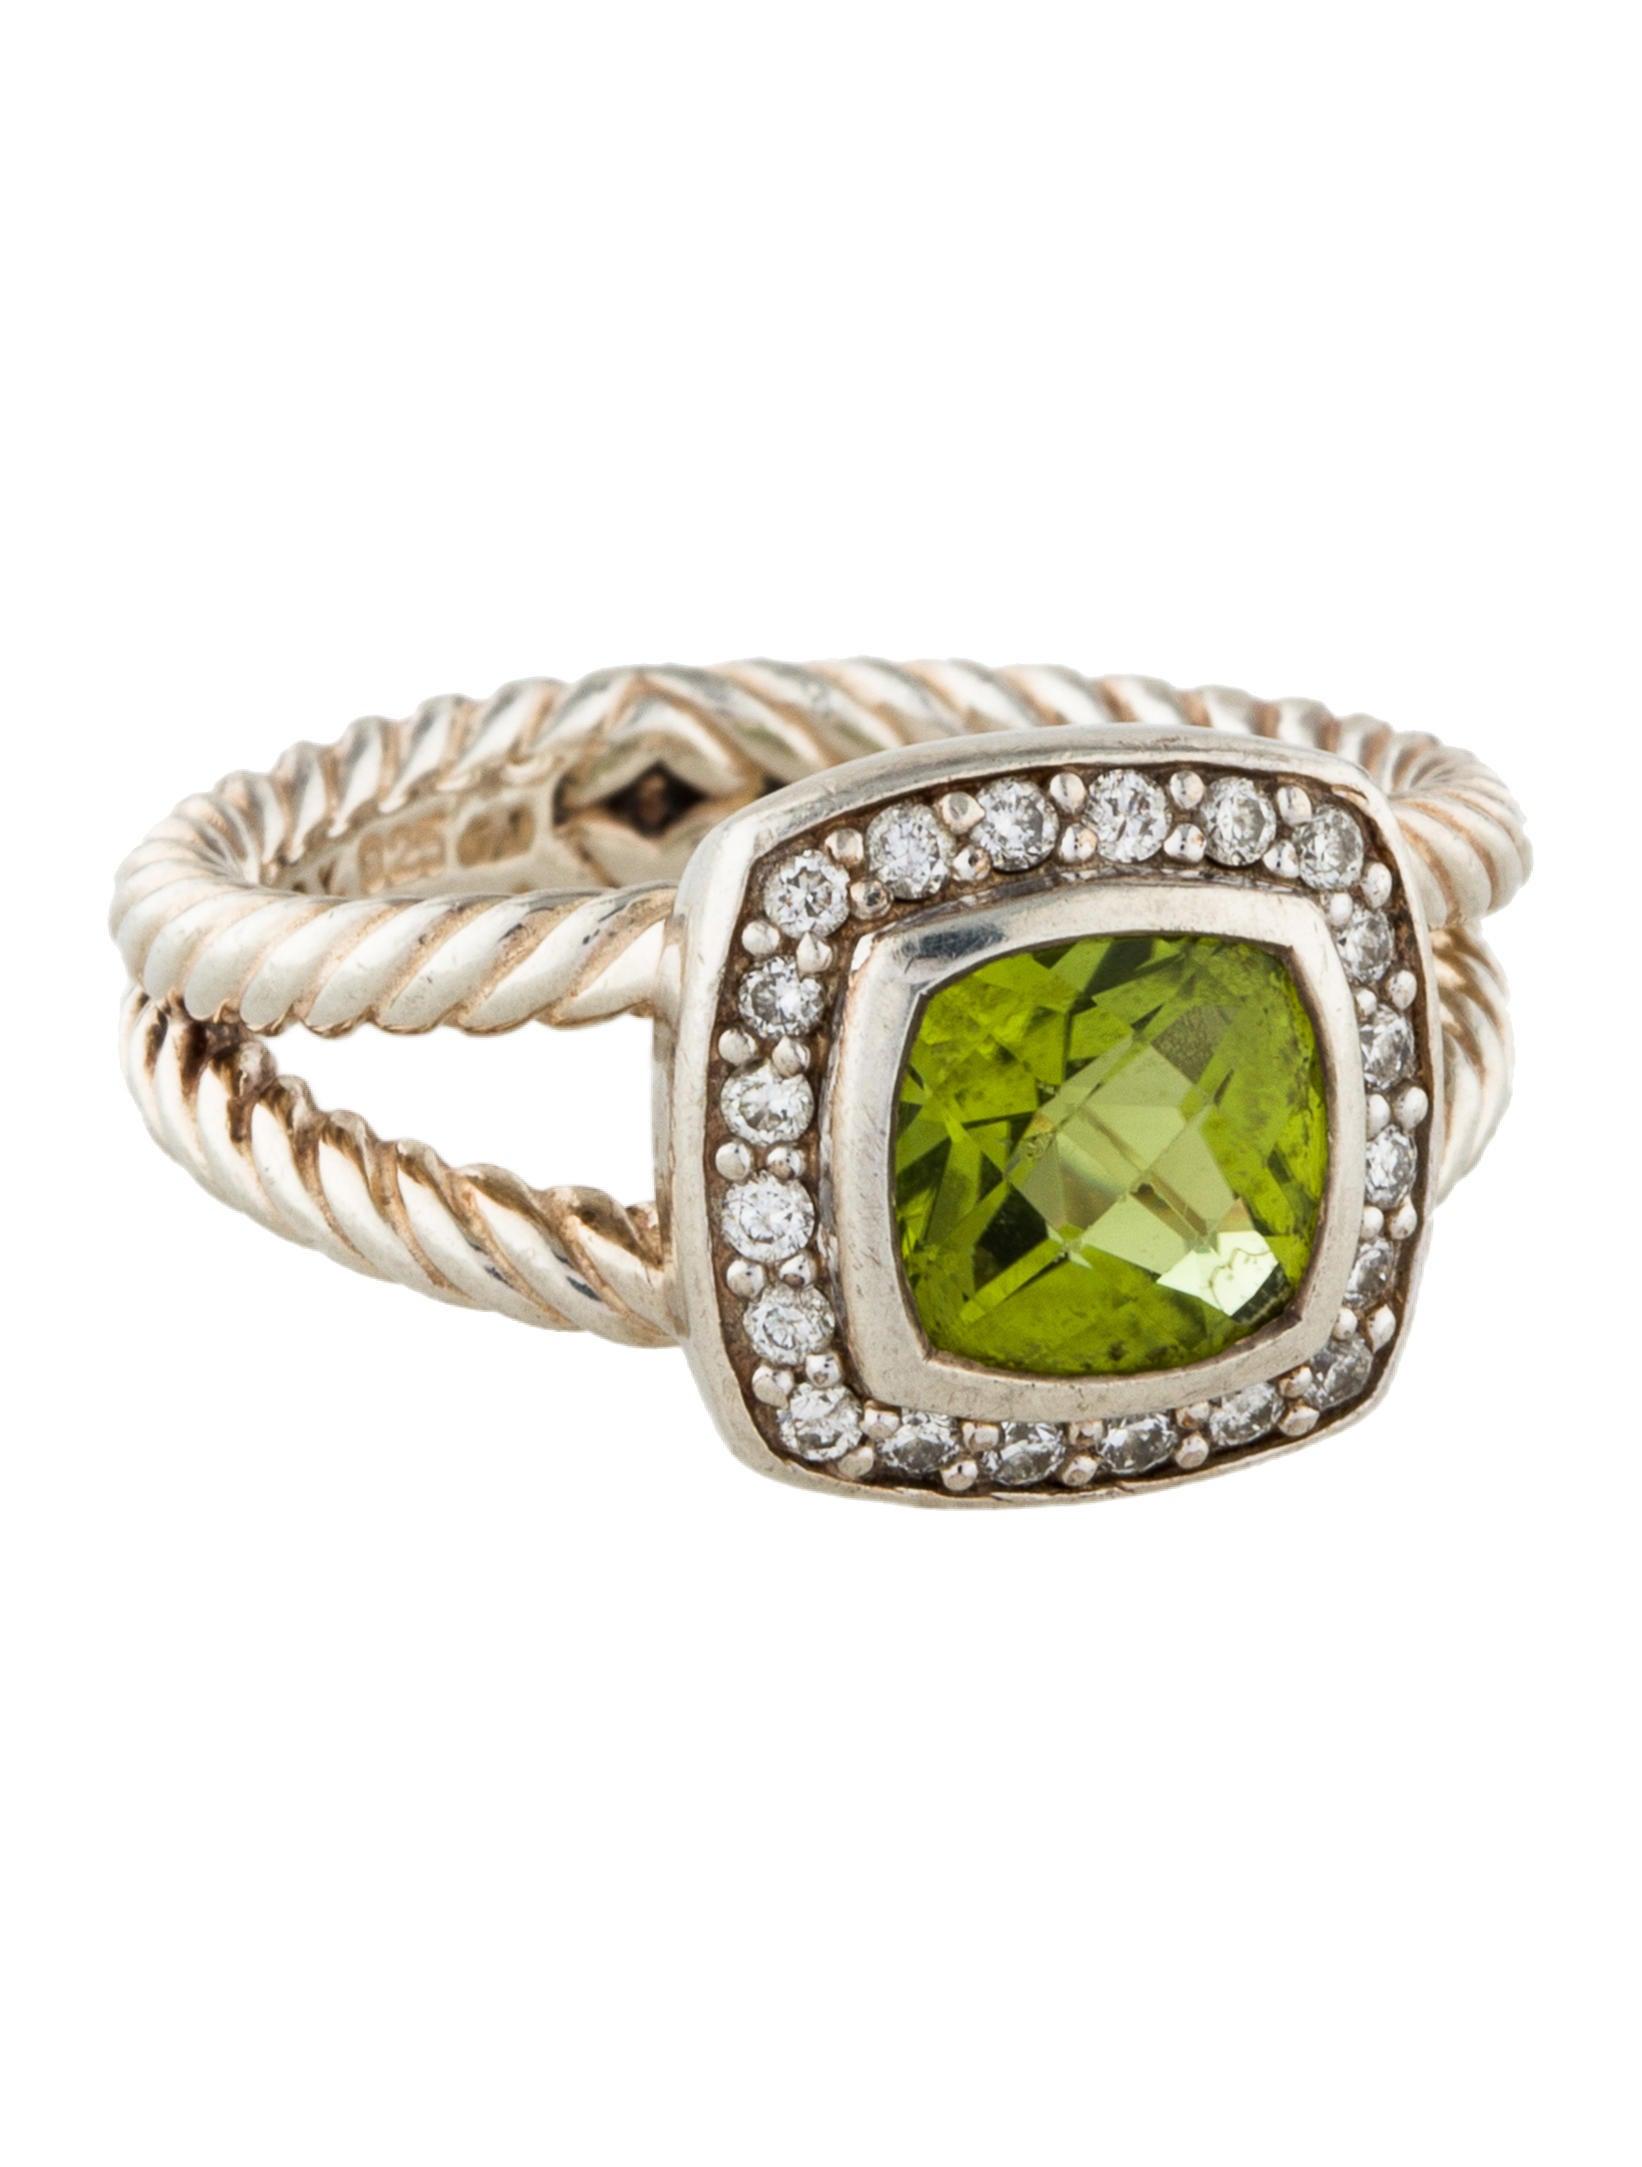 David yurman peridot diamond petite albion cocktail ring for David yurman inspired jewelry rings